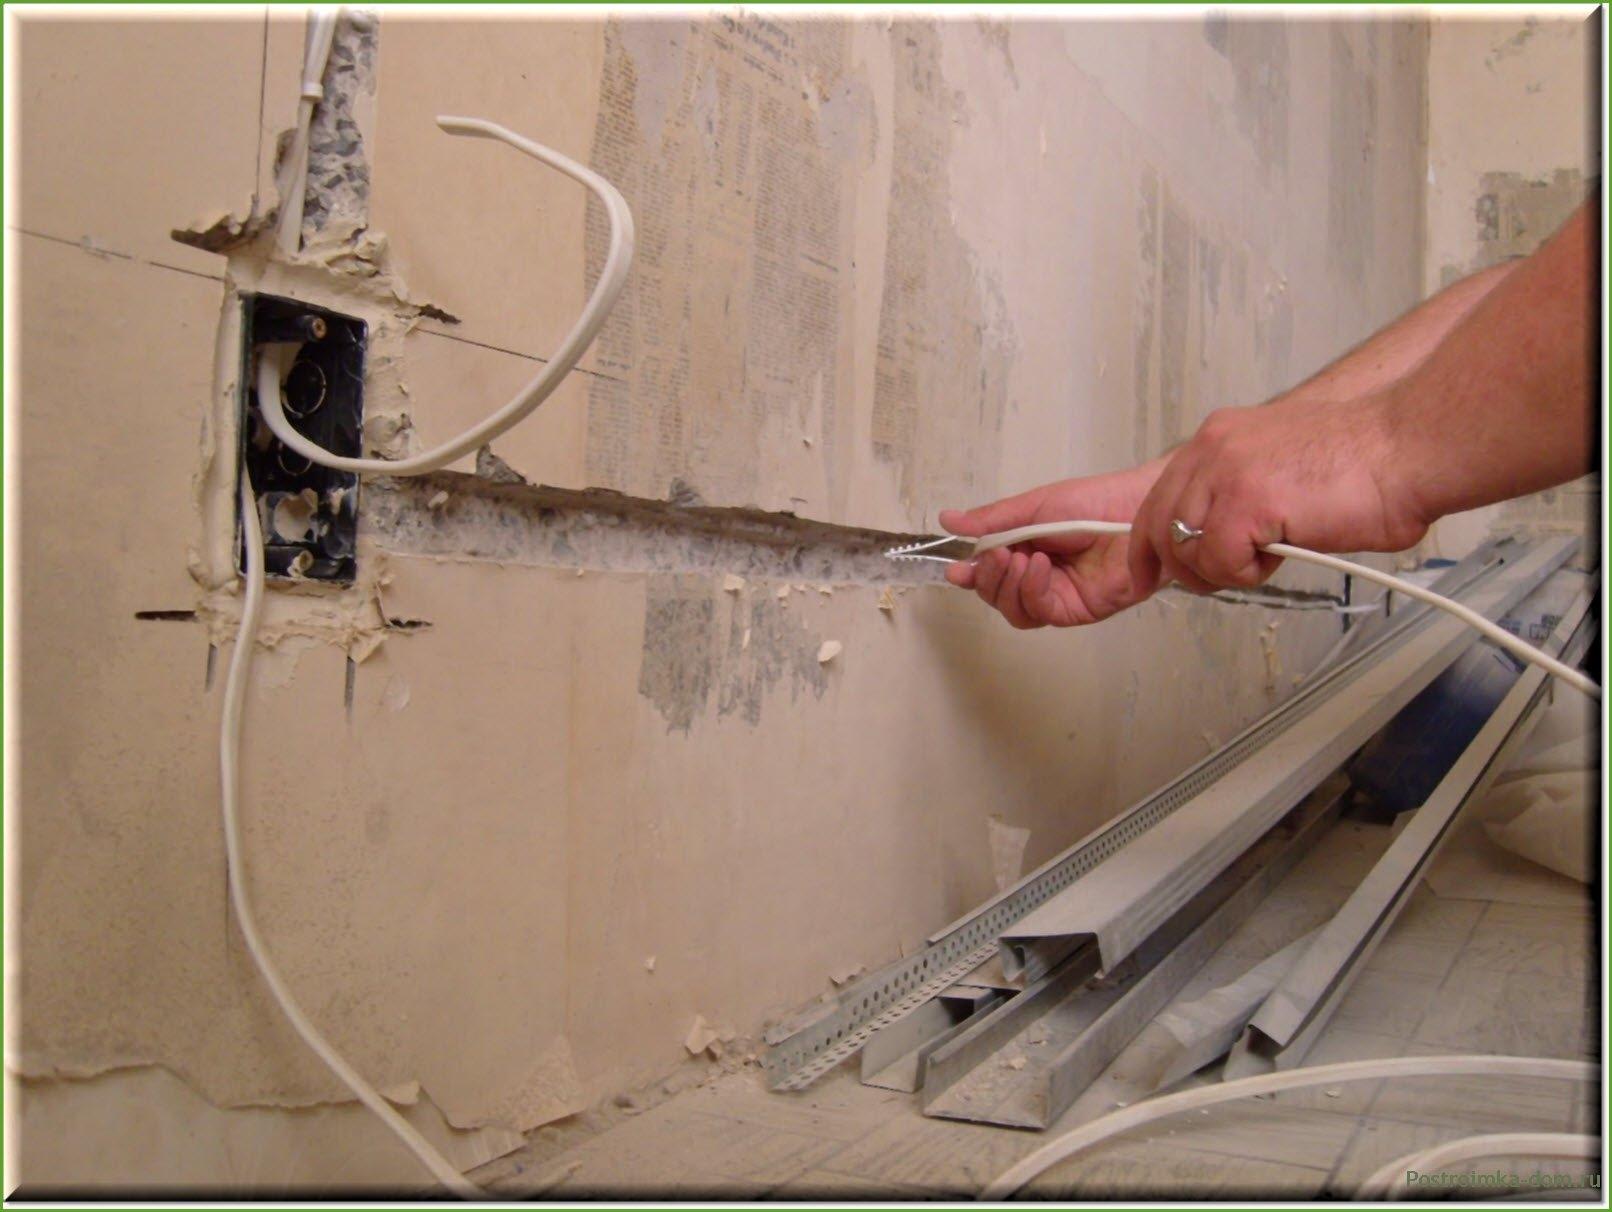 Электропроводка в квартире своими руками: схема, видео, фото 198